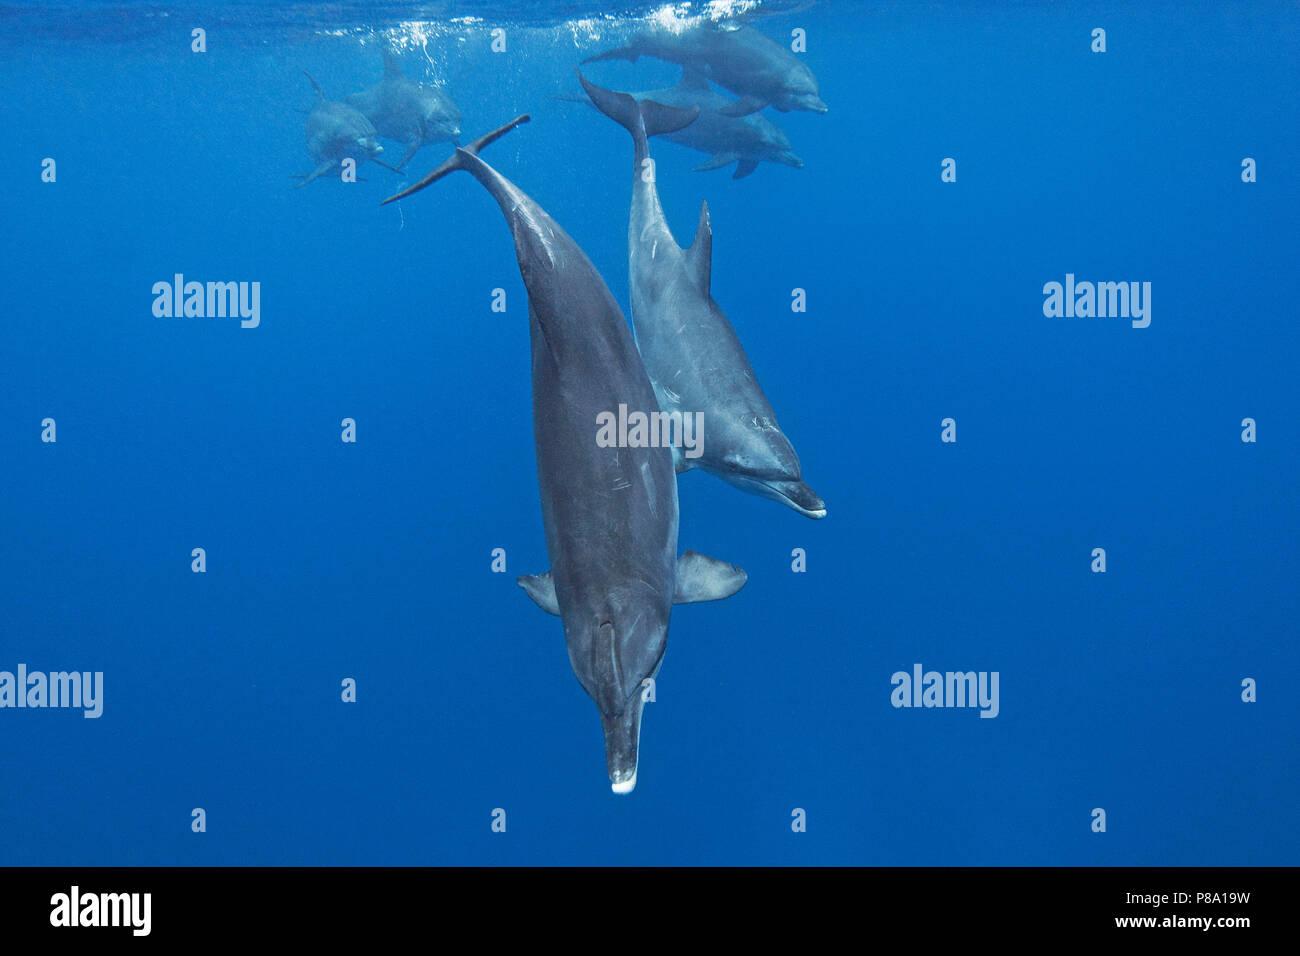 Indo-Pacific bottlenose dolphin (Tursiops aduncus), Group, Ogasawara, Japan - Stock Image